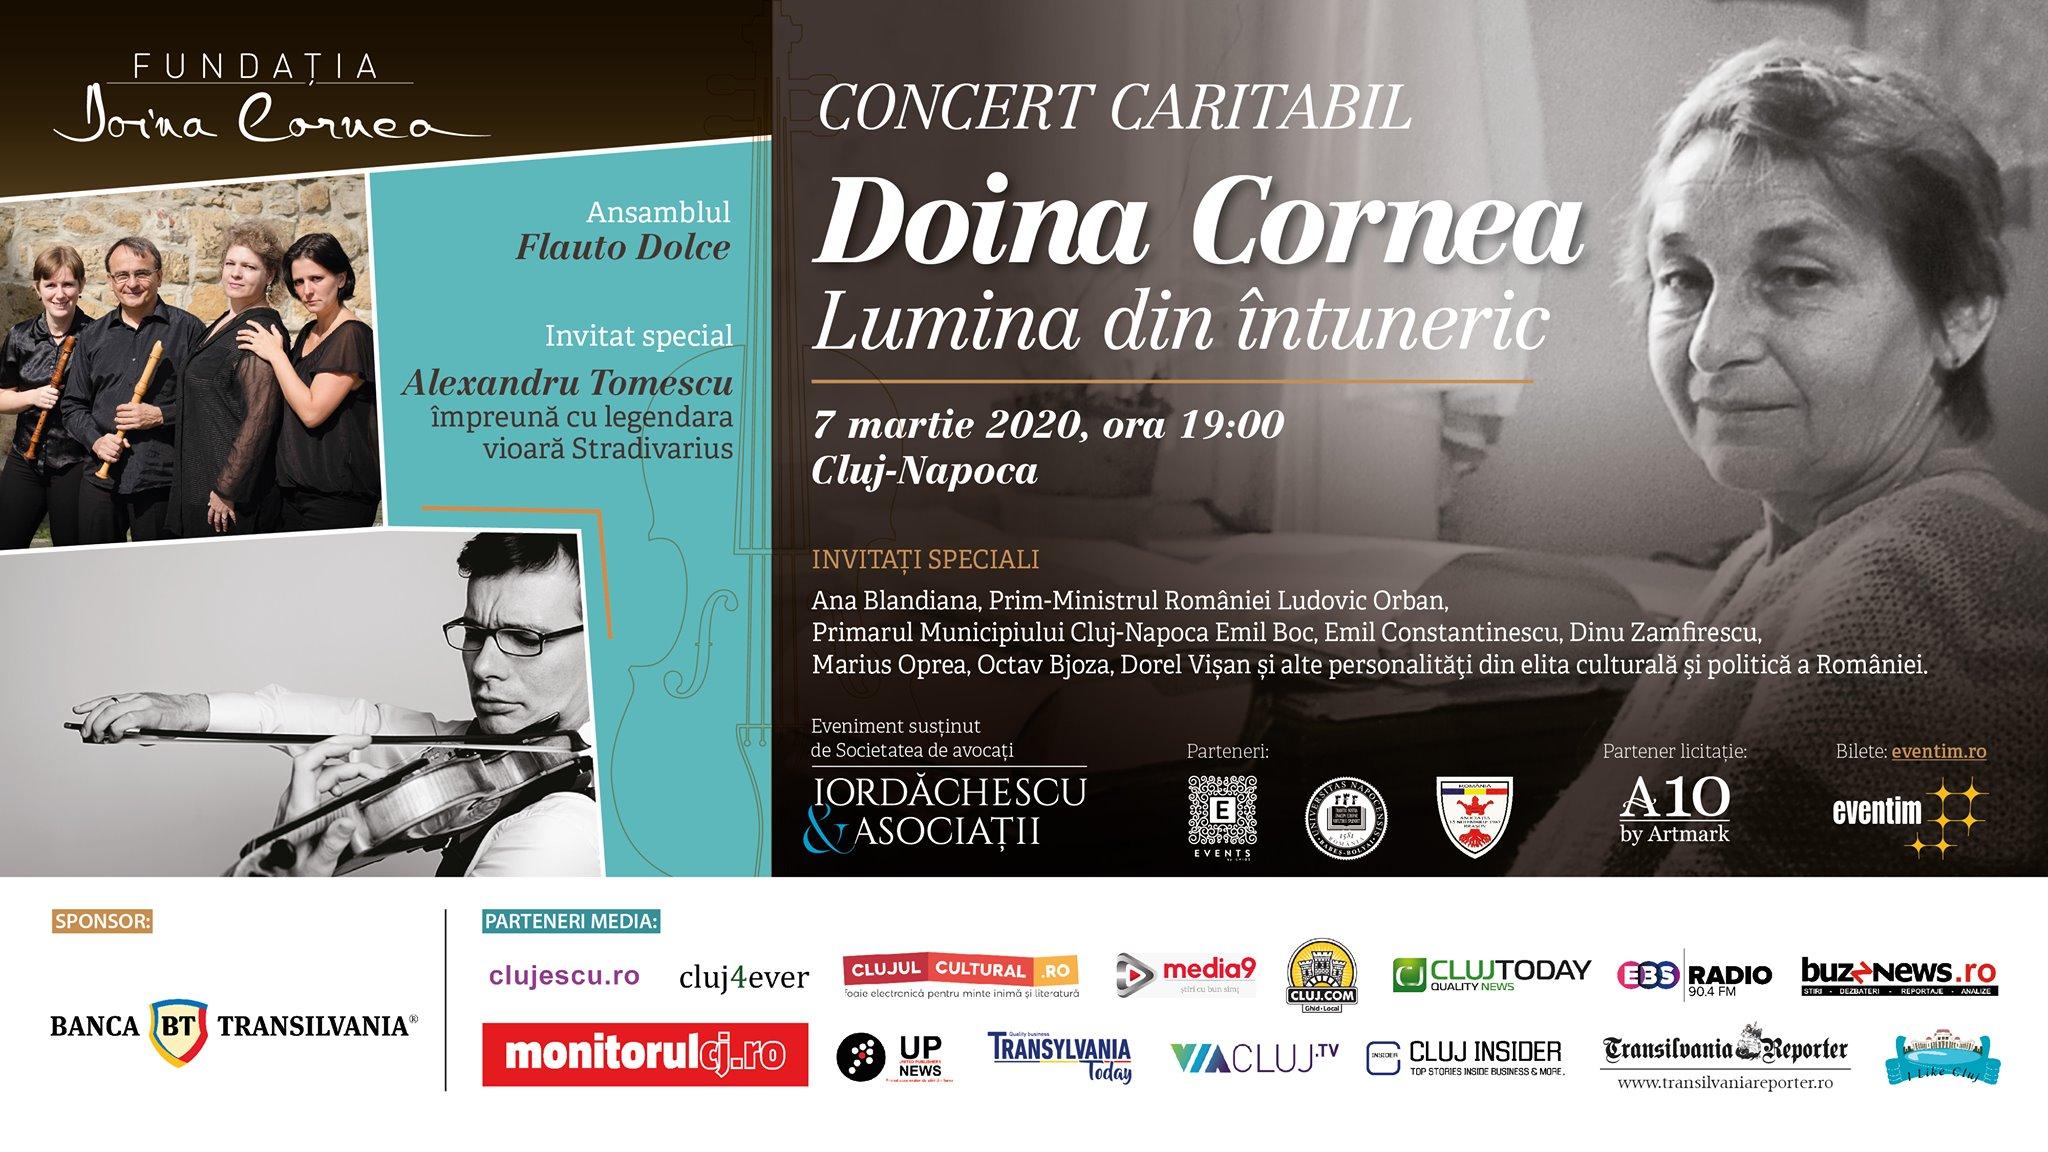 Concert caritabil: Doina Cornea – Lumina din întuneric @ Auditorium Maximum